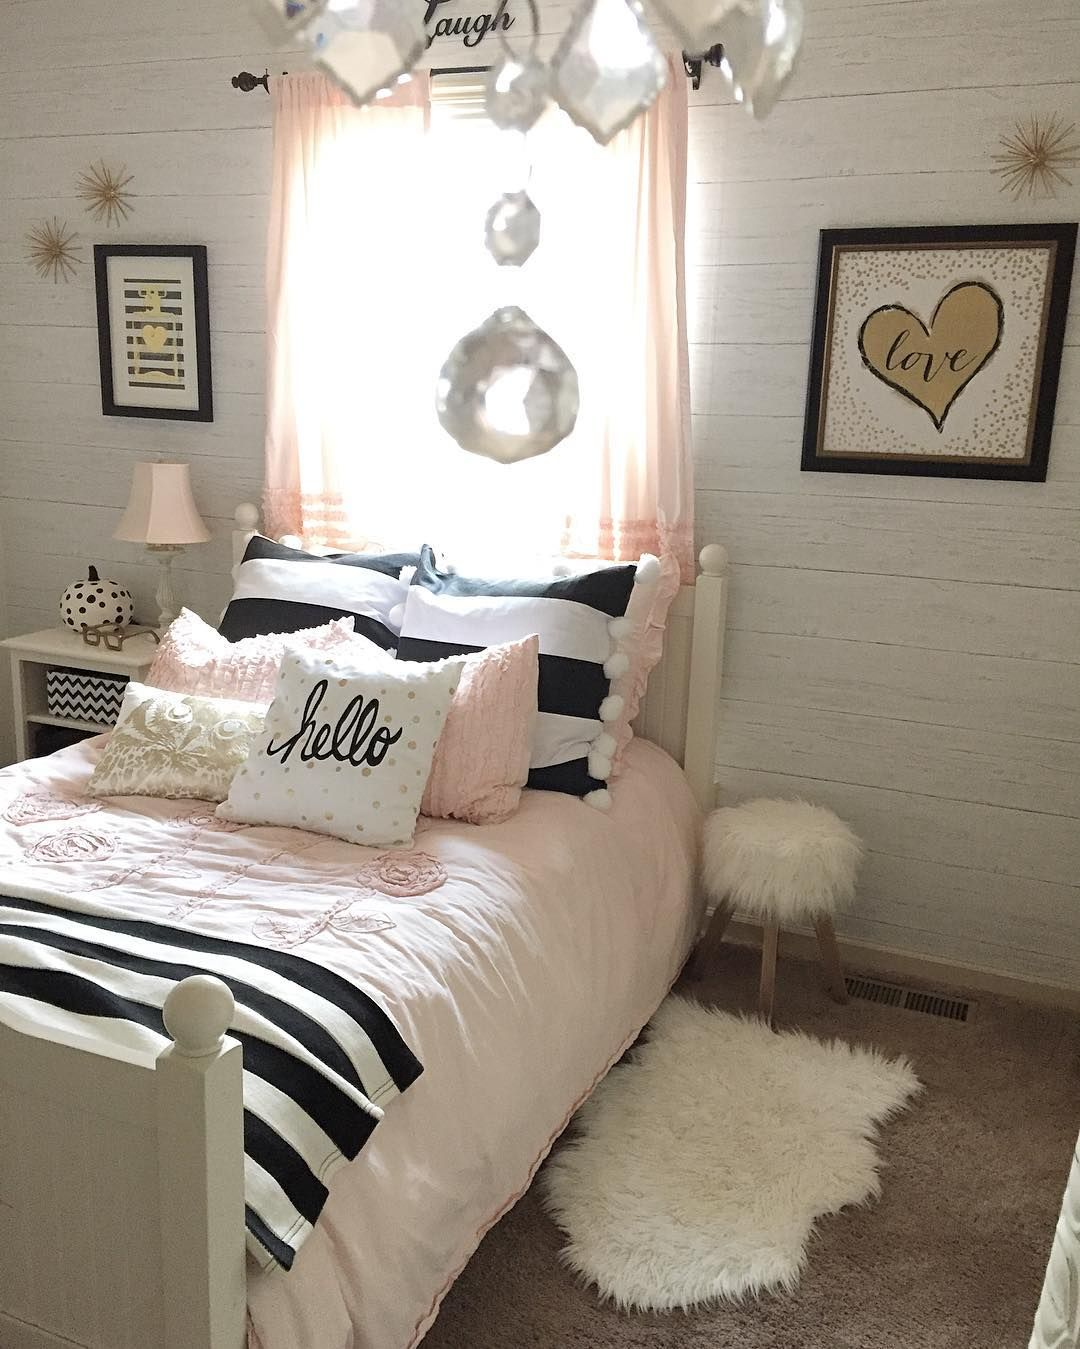 Paris, Prada, Pearls, Perfume | Decore I Like | Pinterest | Perfume, Pearls  And Bedrooms